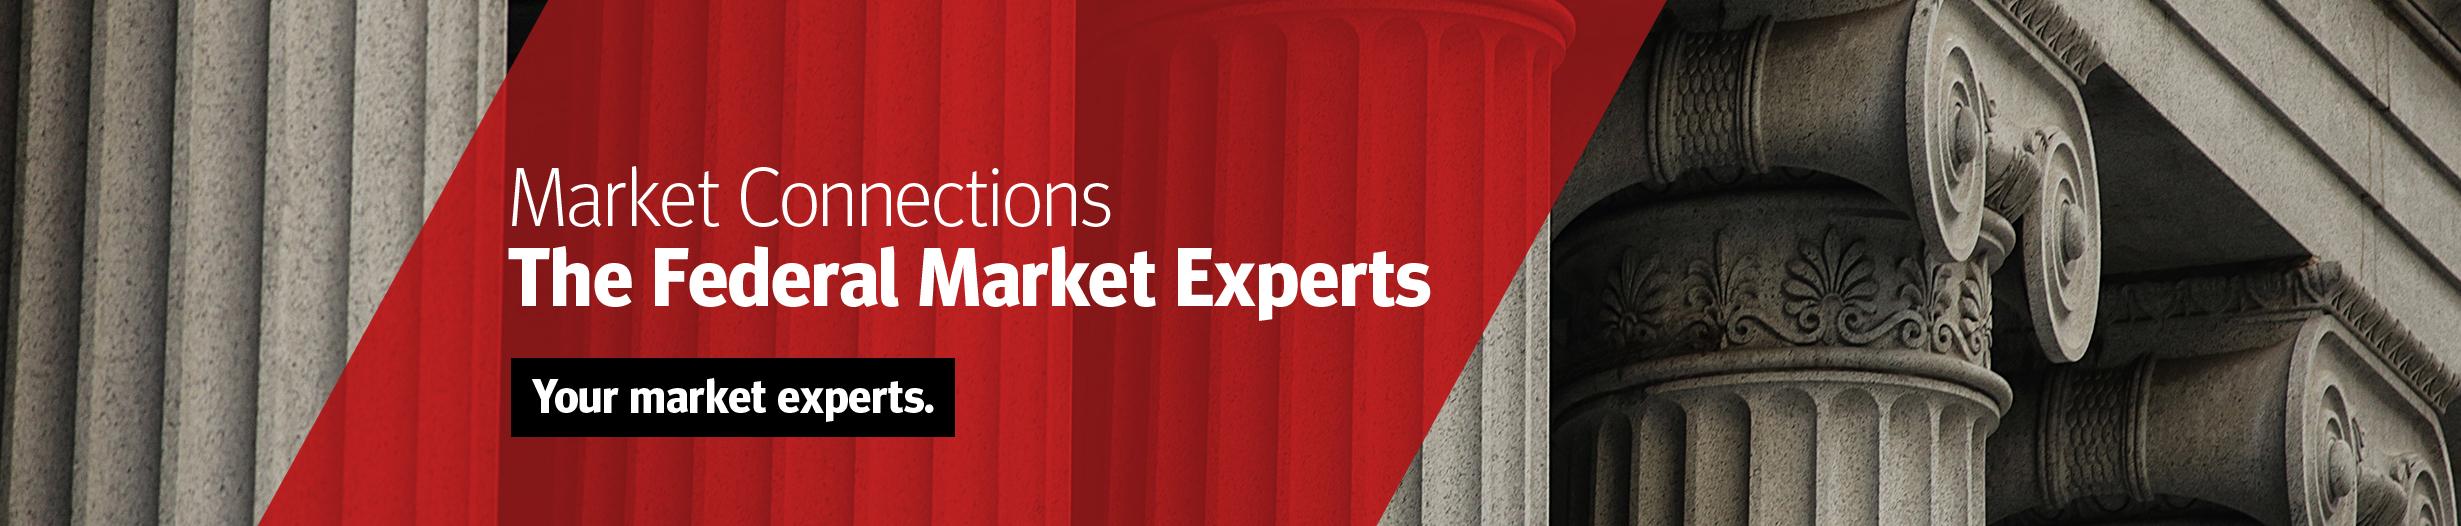 Federal Market Experts